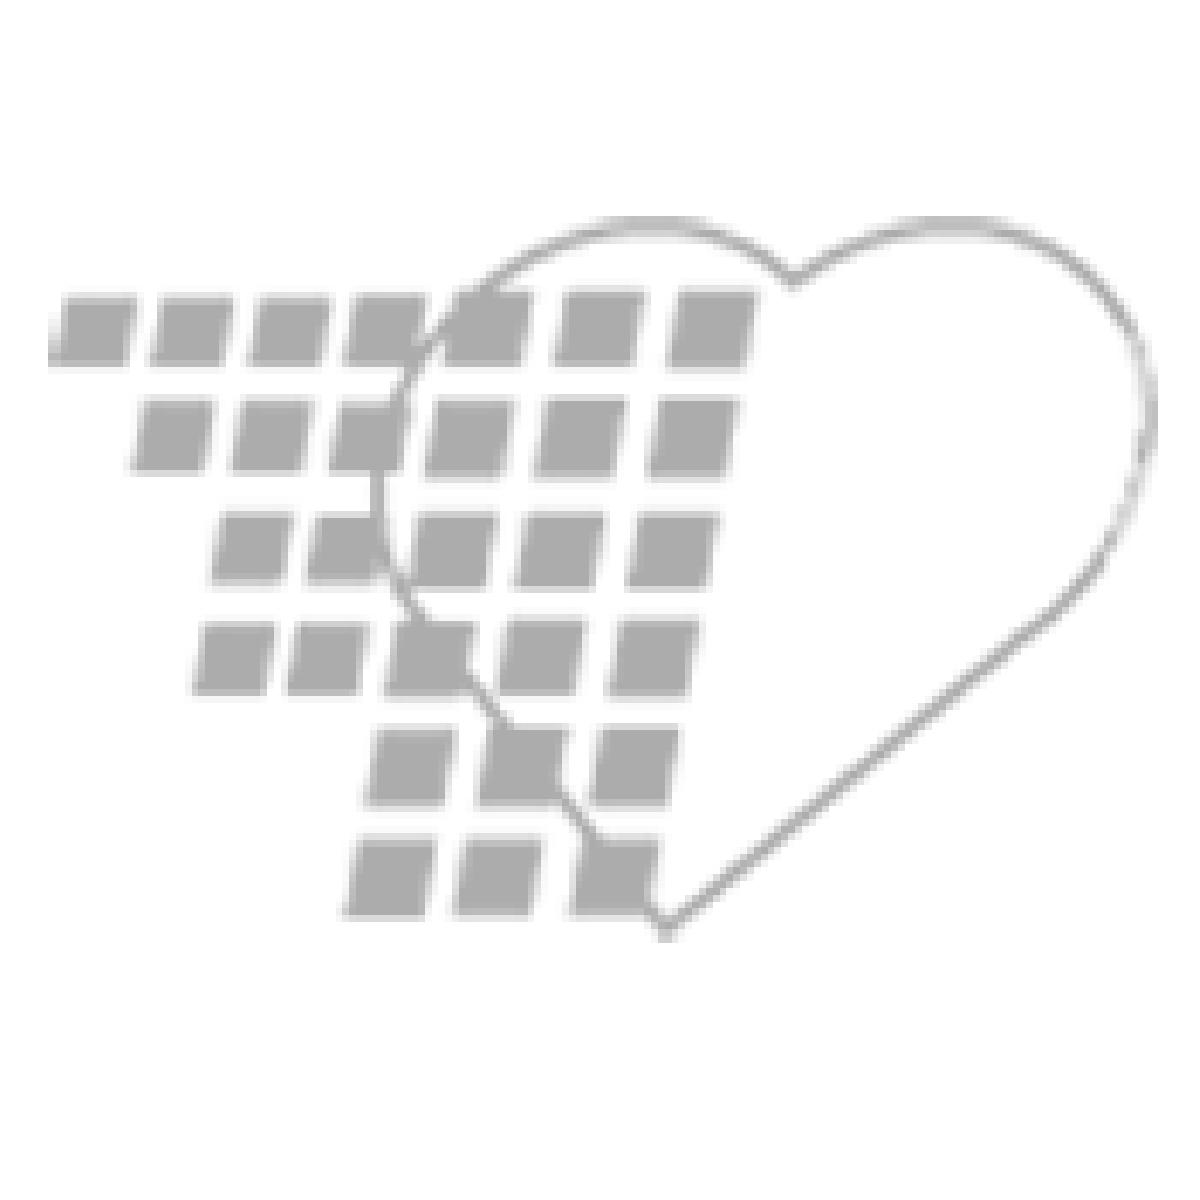 02-43-9001 - ECG Recording Paper for 02-43-9000